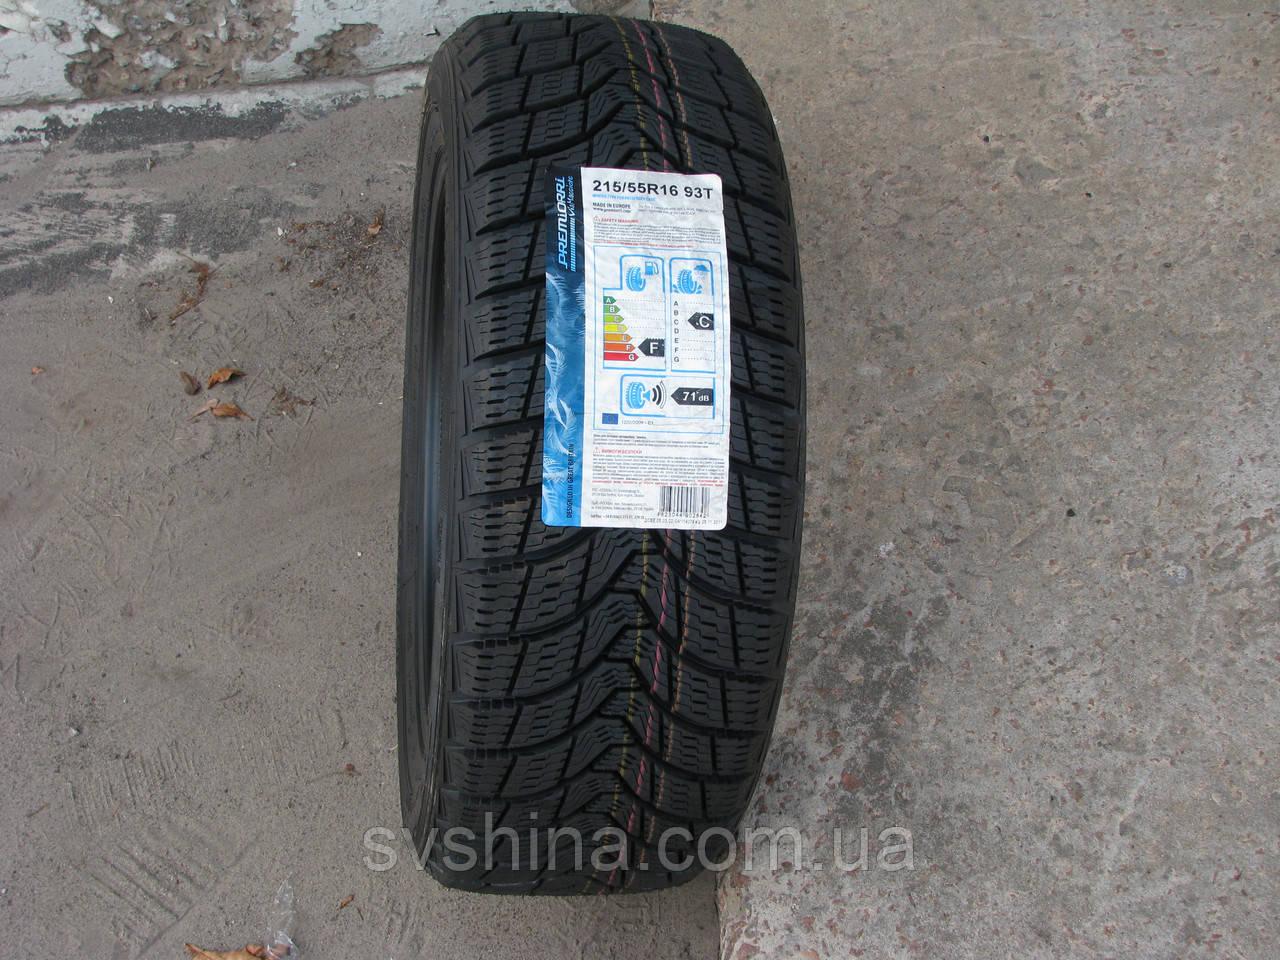 Зимние шины 215/55R16 Premiorri Via Maggiore, 93T